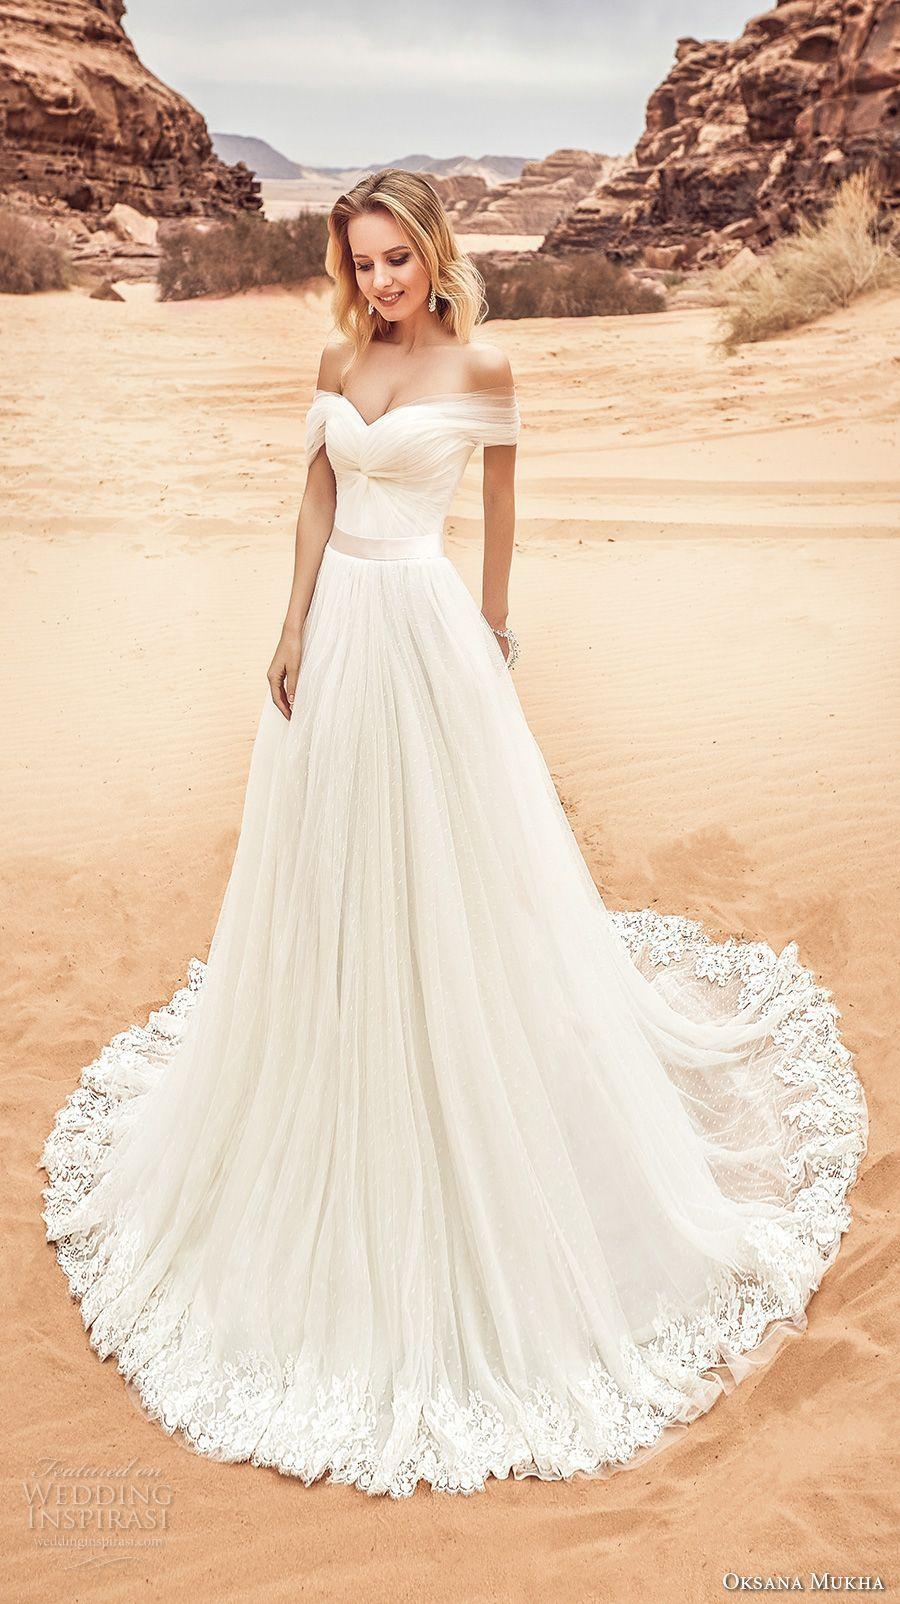 Corset Organza Wedding Dress By Camille La Vie | wedding ideas ...